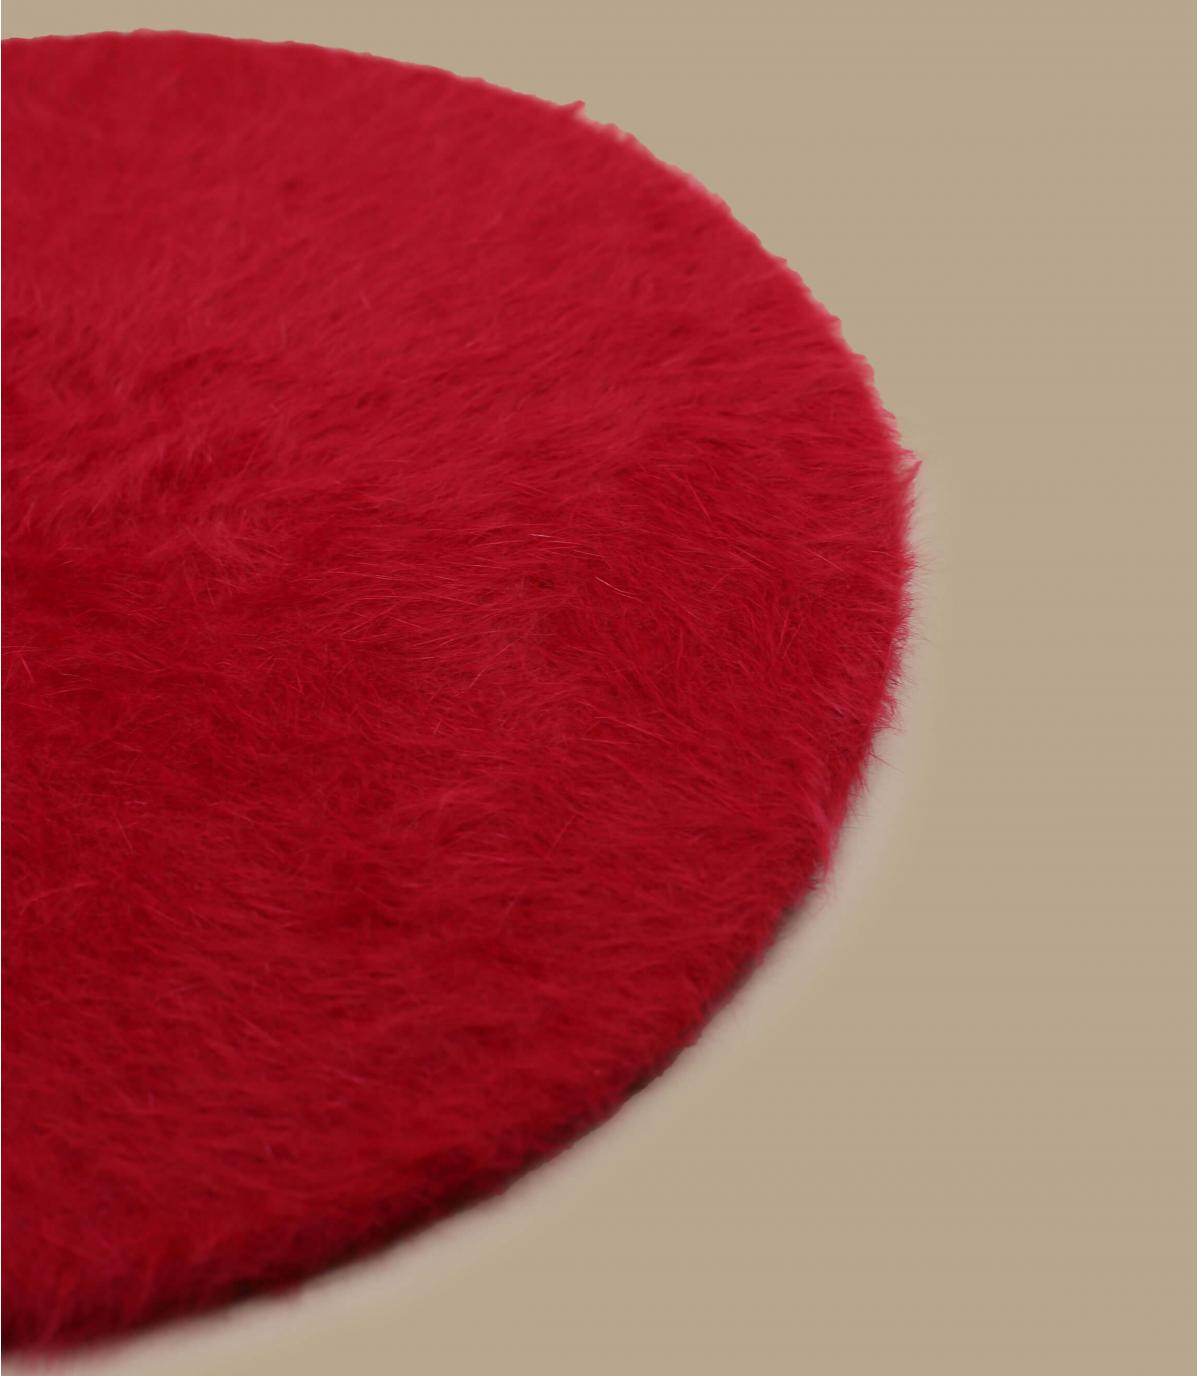 Details Beret angora hermes - Abbildung 3